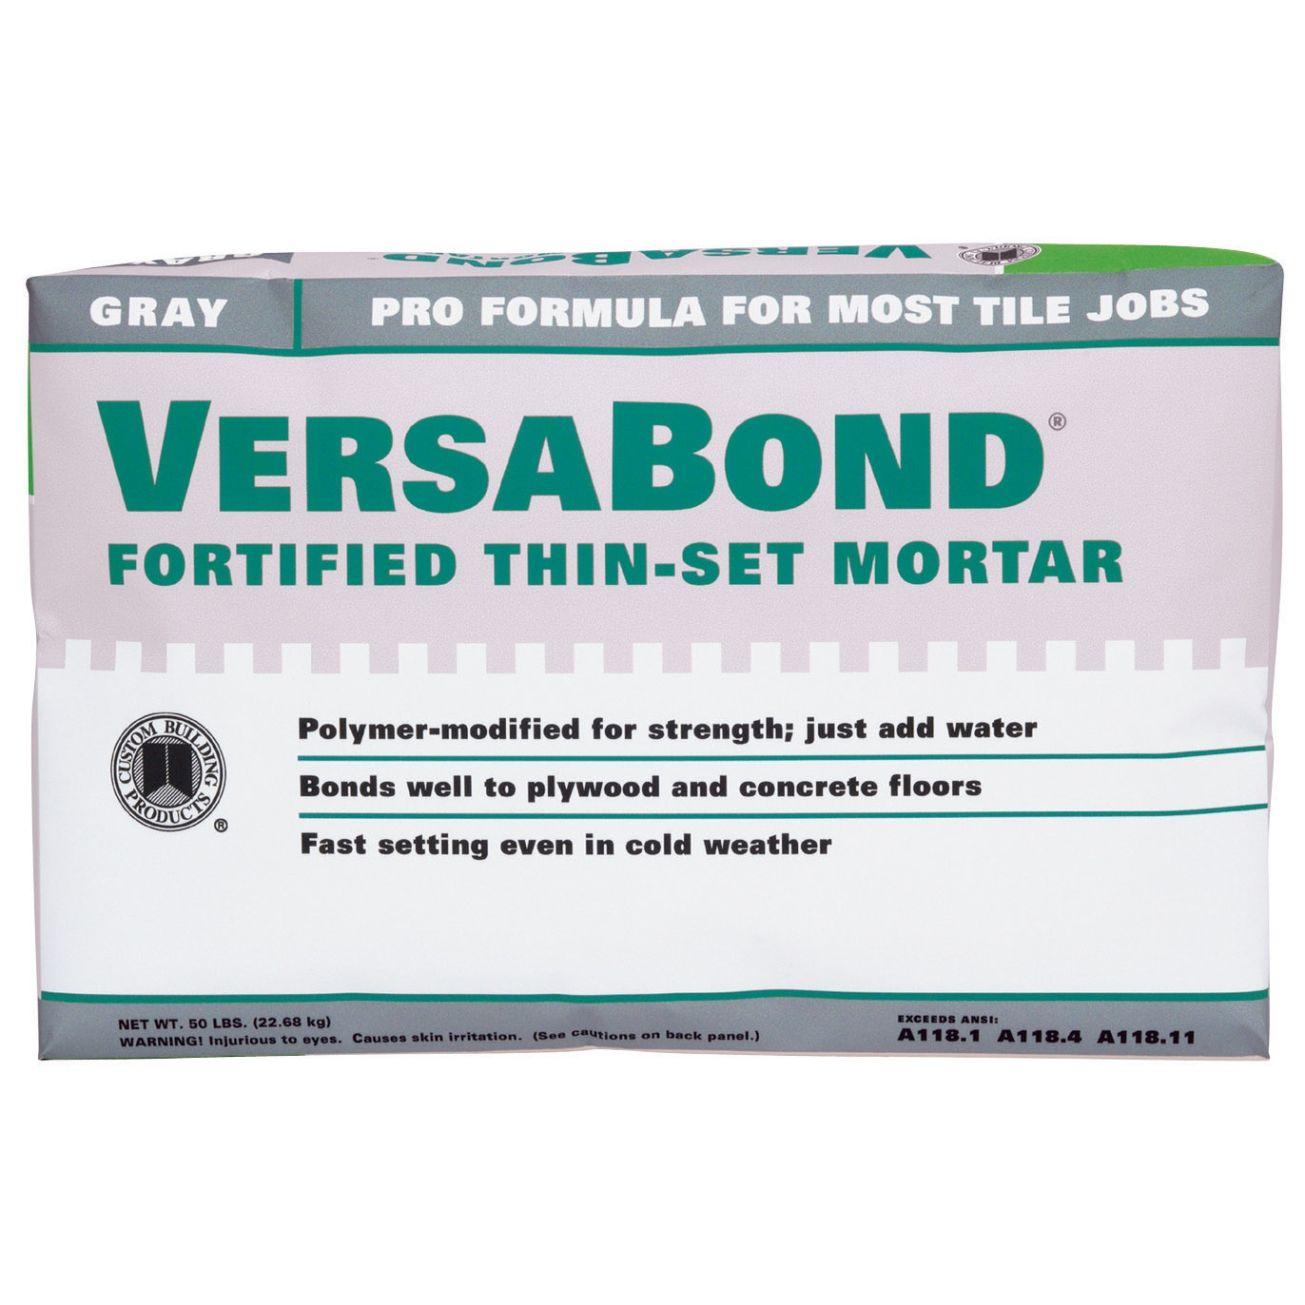 VersaBond Lb Bonding Mortar Mortars Ace Hardware Mosaic And - Custom blend thin set mortar